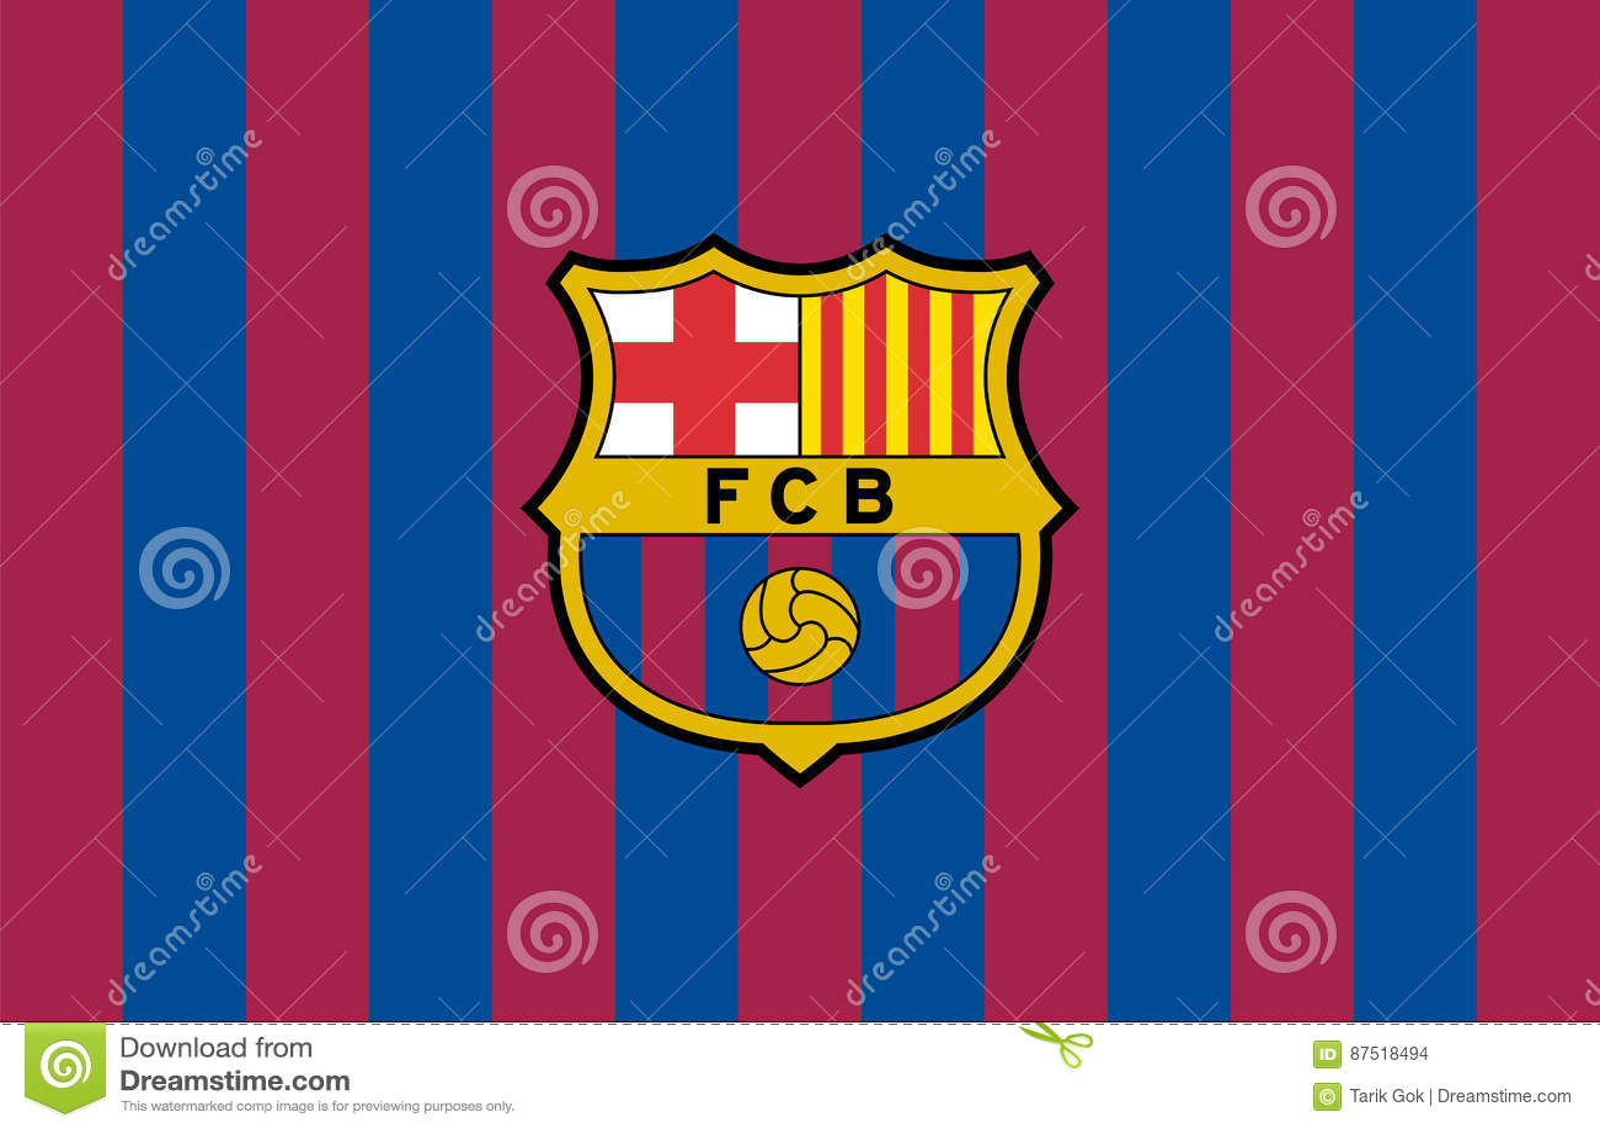 Fc barcelona logo editorial stock image illustration of catalonia fc barcelona logo catalonia team biocorpaavc